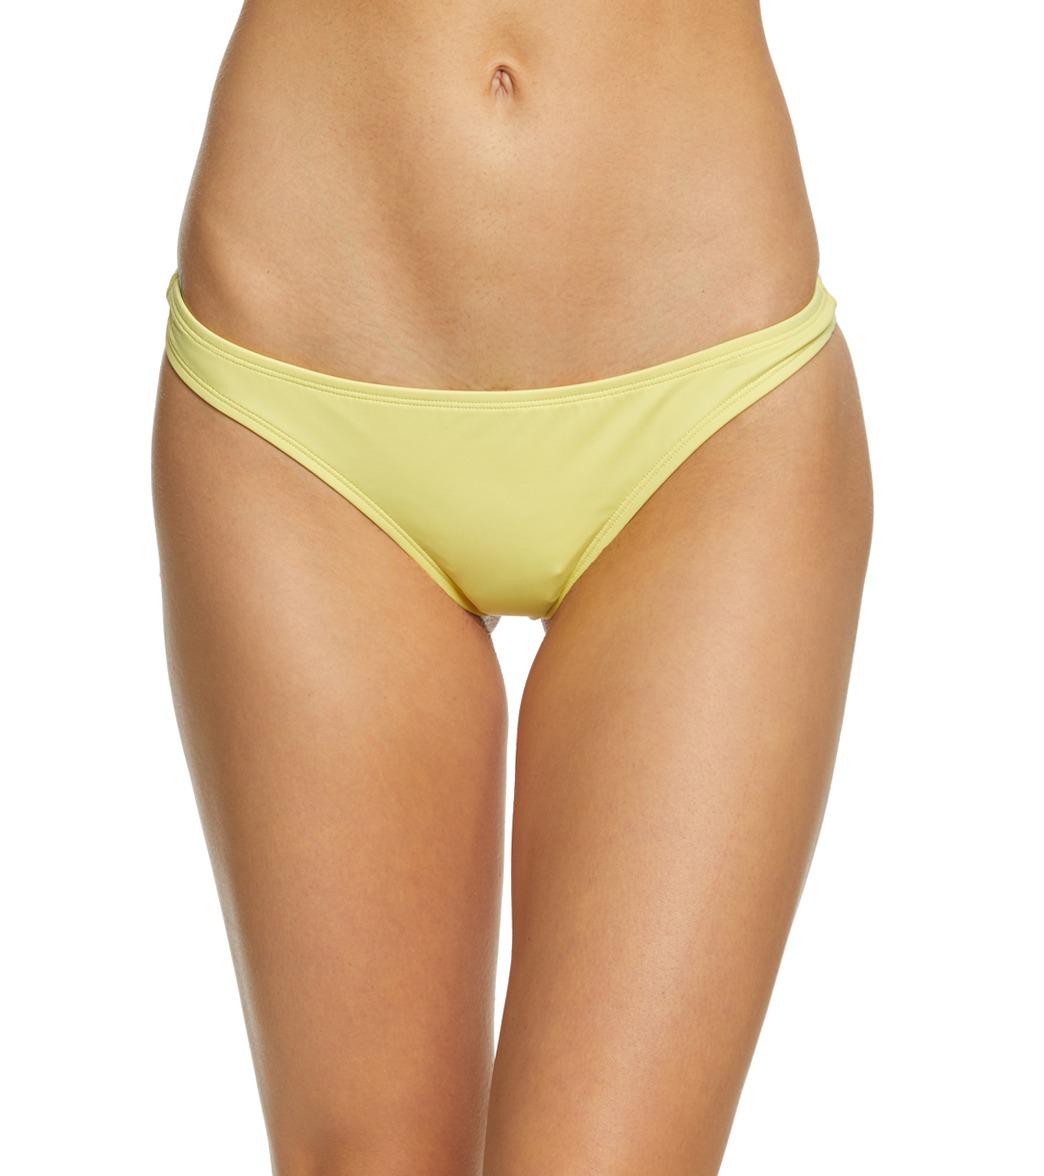 Billabong Women's Reissue Tanga Bikini Bottom